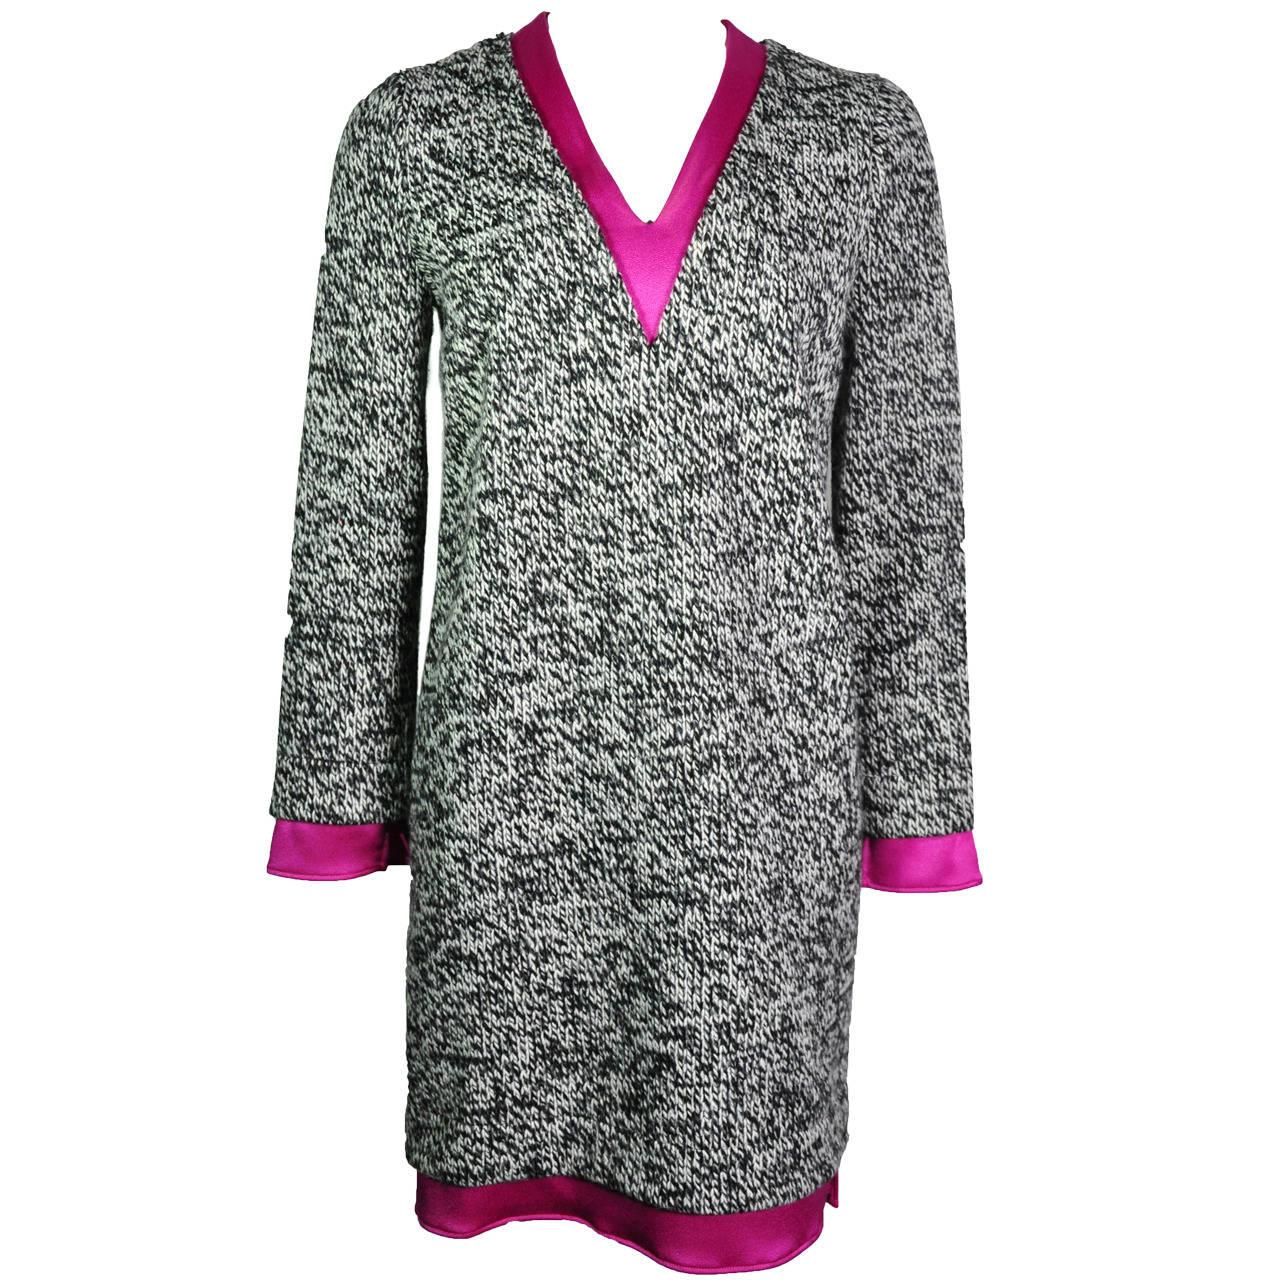 Balenciaga Multi Color Wool Blend Knit Dress